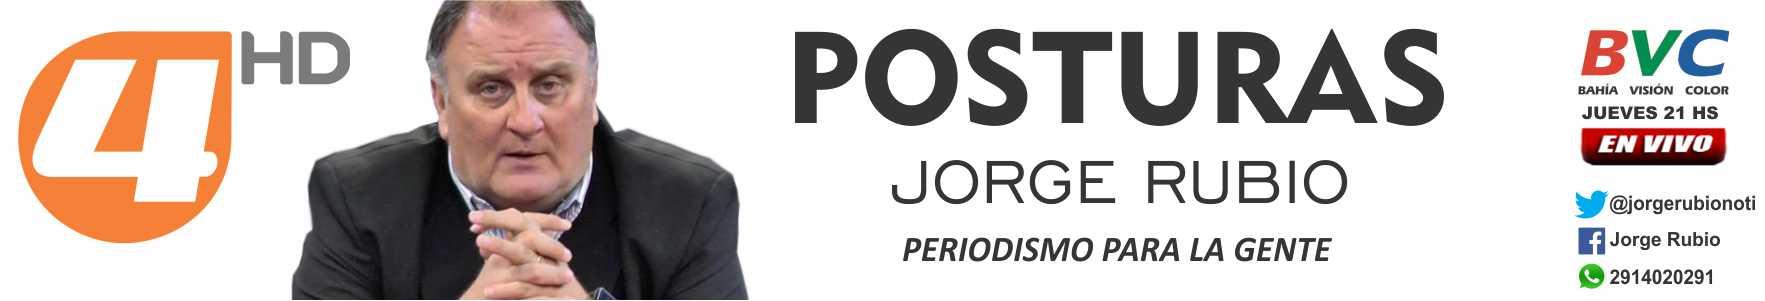 Jorge Rubio Periodismo para la Gente